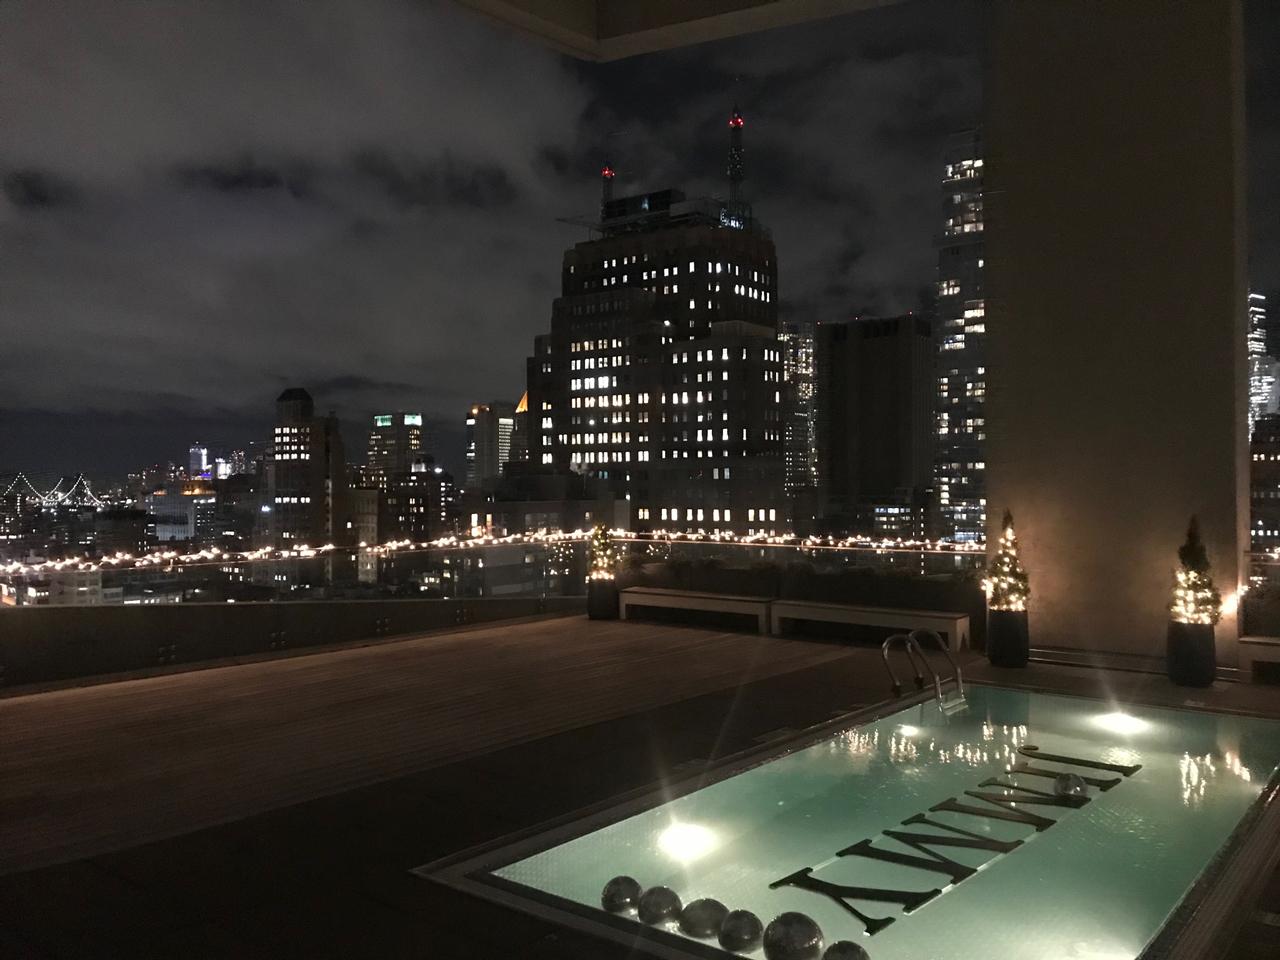 Skyline-Blick beim Get-Together vor der New York Jobfair.